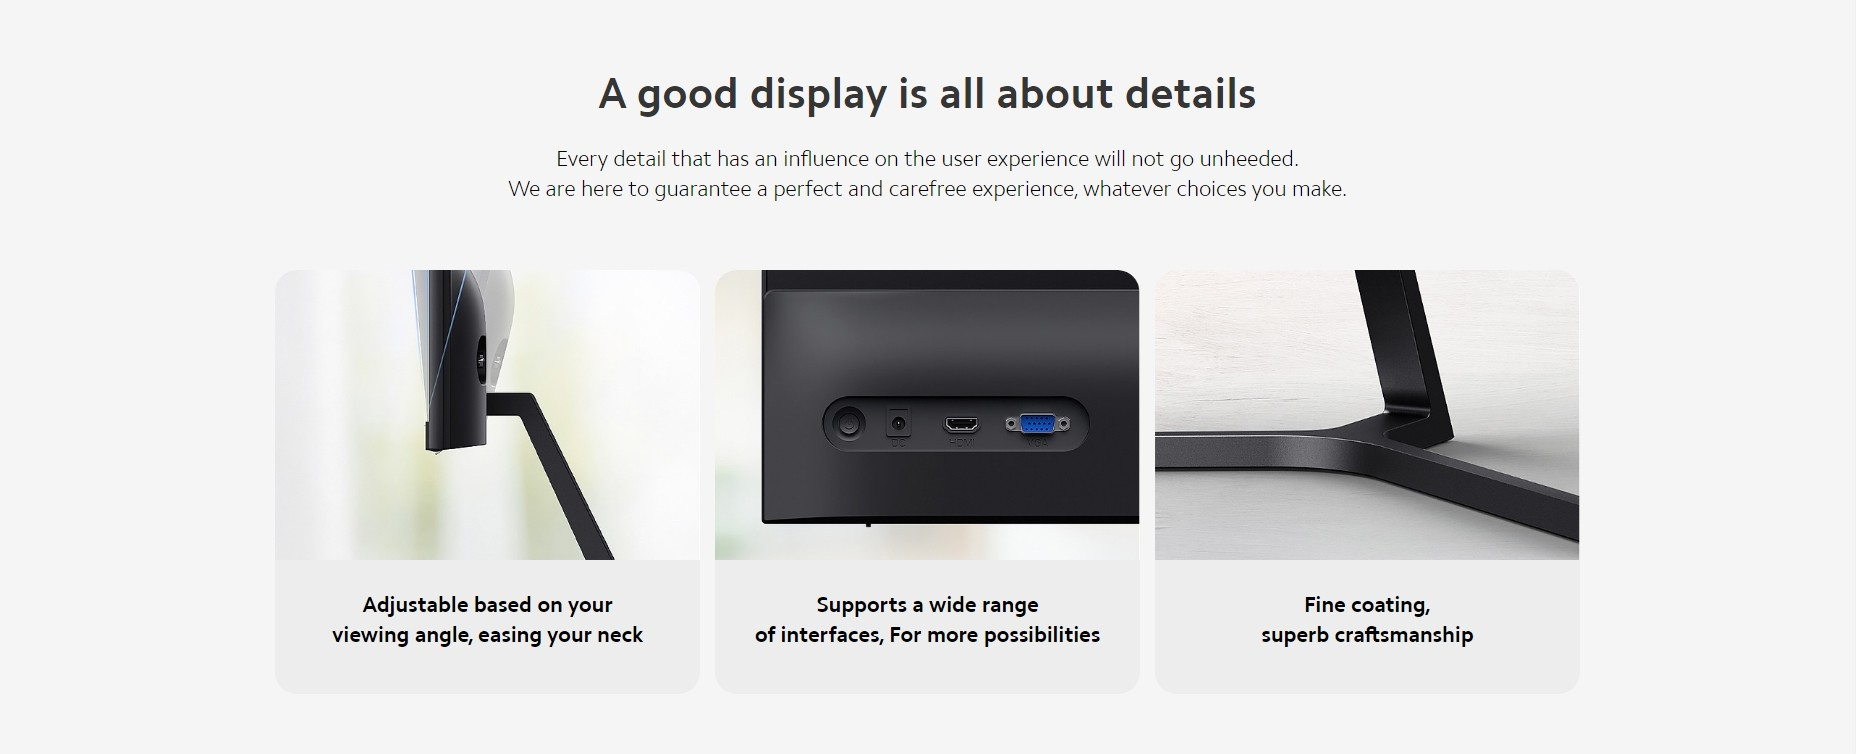 Xiaomi Desktop-PC-Monitor 1C Xiaomi 23,8'' Desktop-Monitor 1C 1080P Full HD Display Bildschirm Low Blue Light